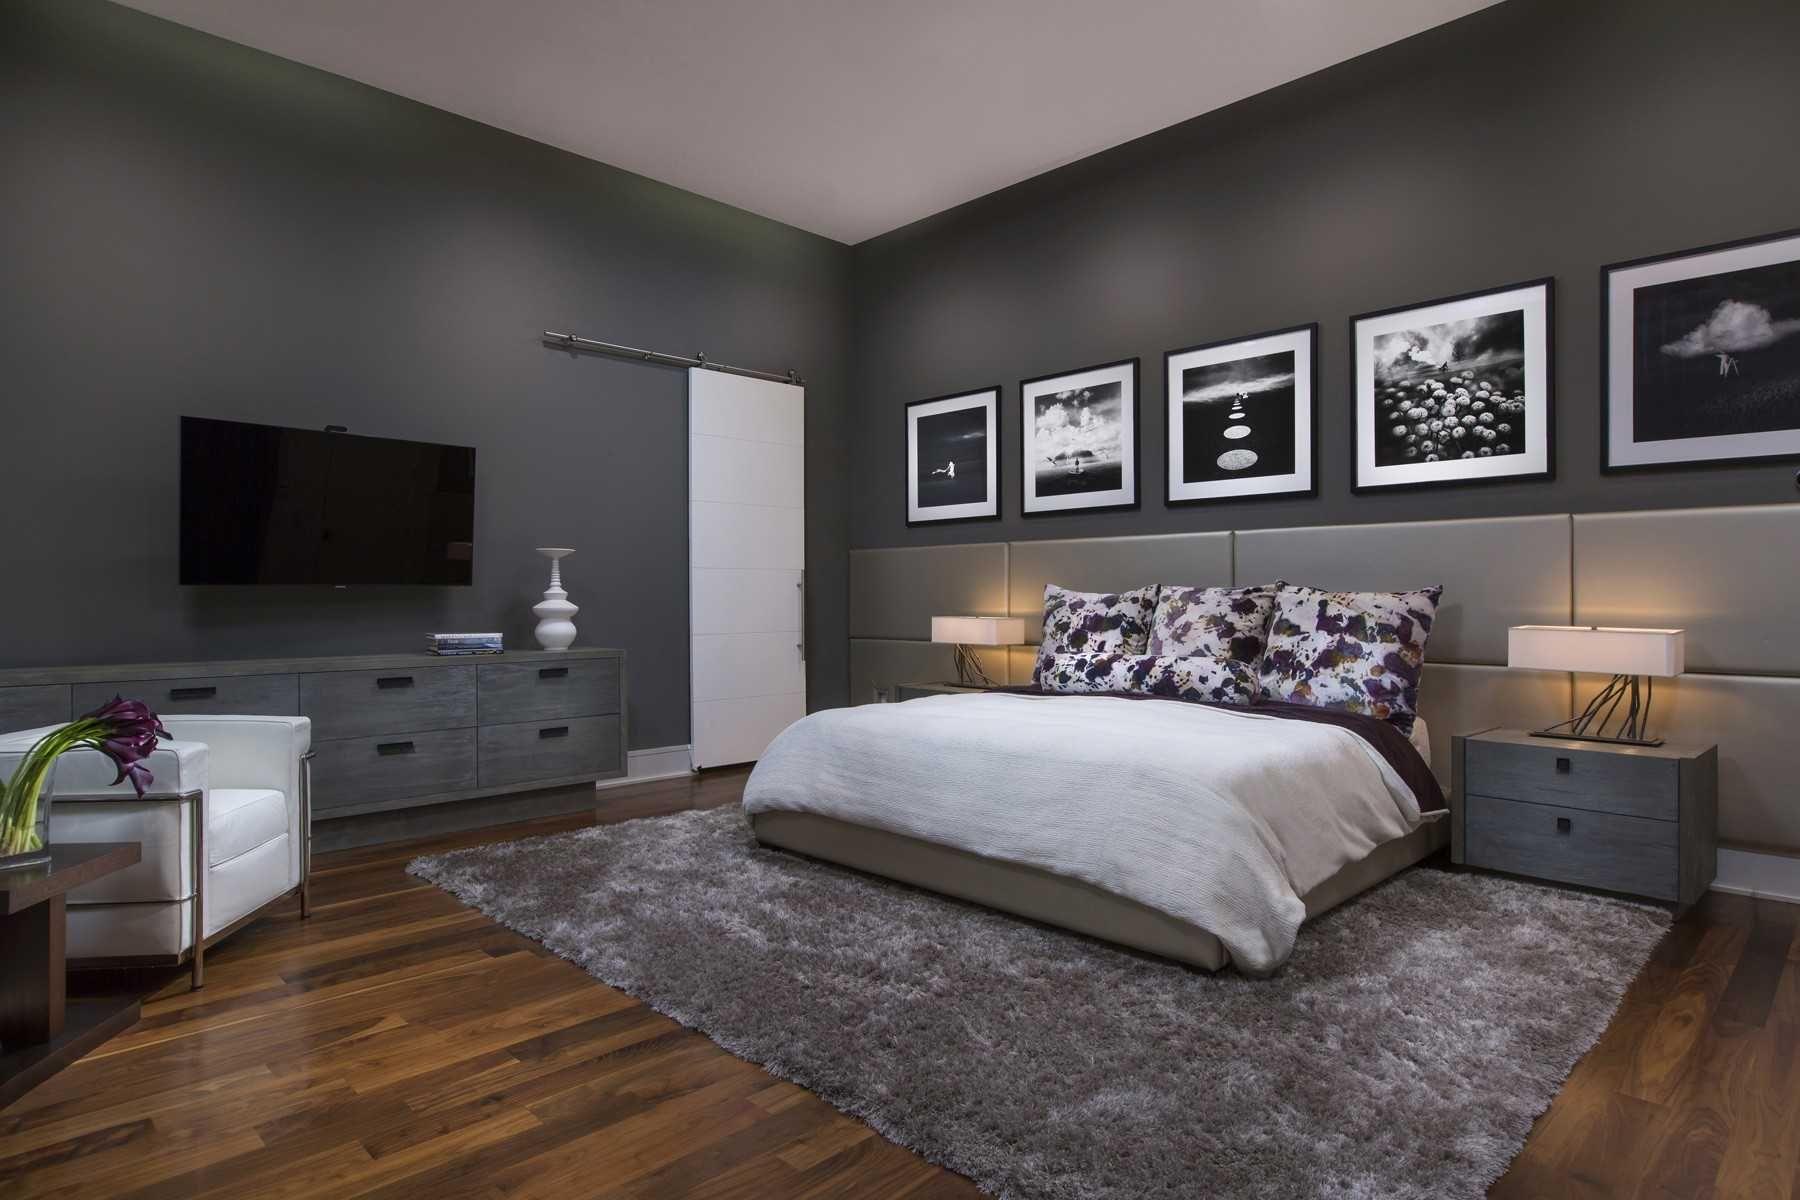 Best احدث الوان غرف نوم مودرن 2019 Modern Bedrooms 2020 400 x 300